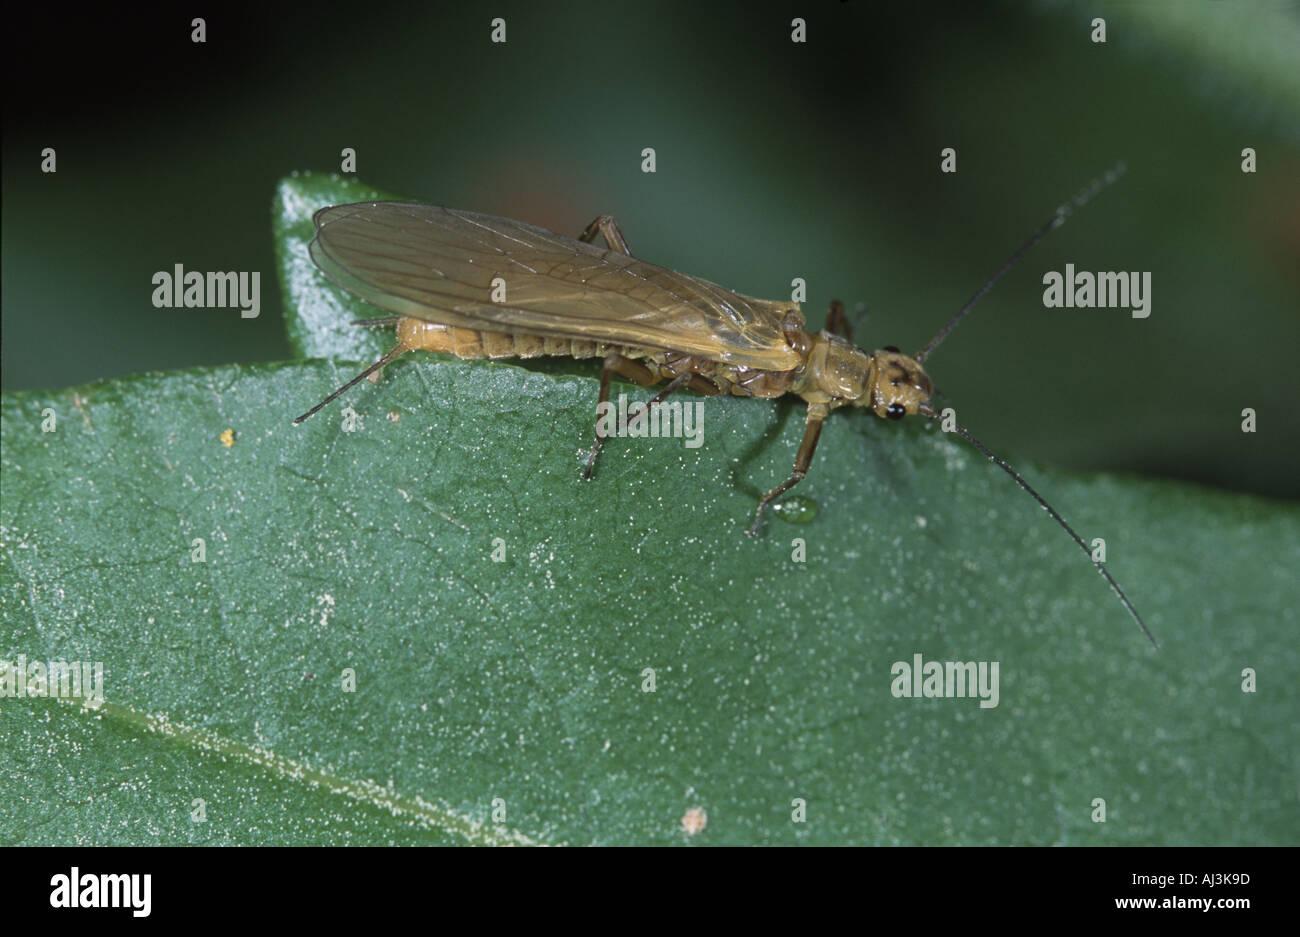 Adult Stonefly Plecoptera Isoperla grammatica - Stock Image